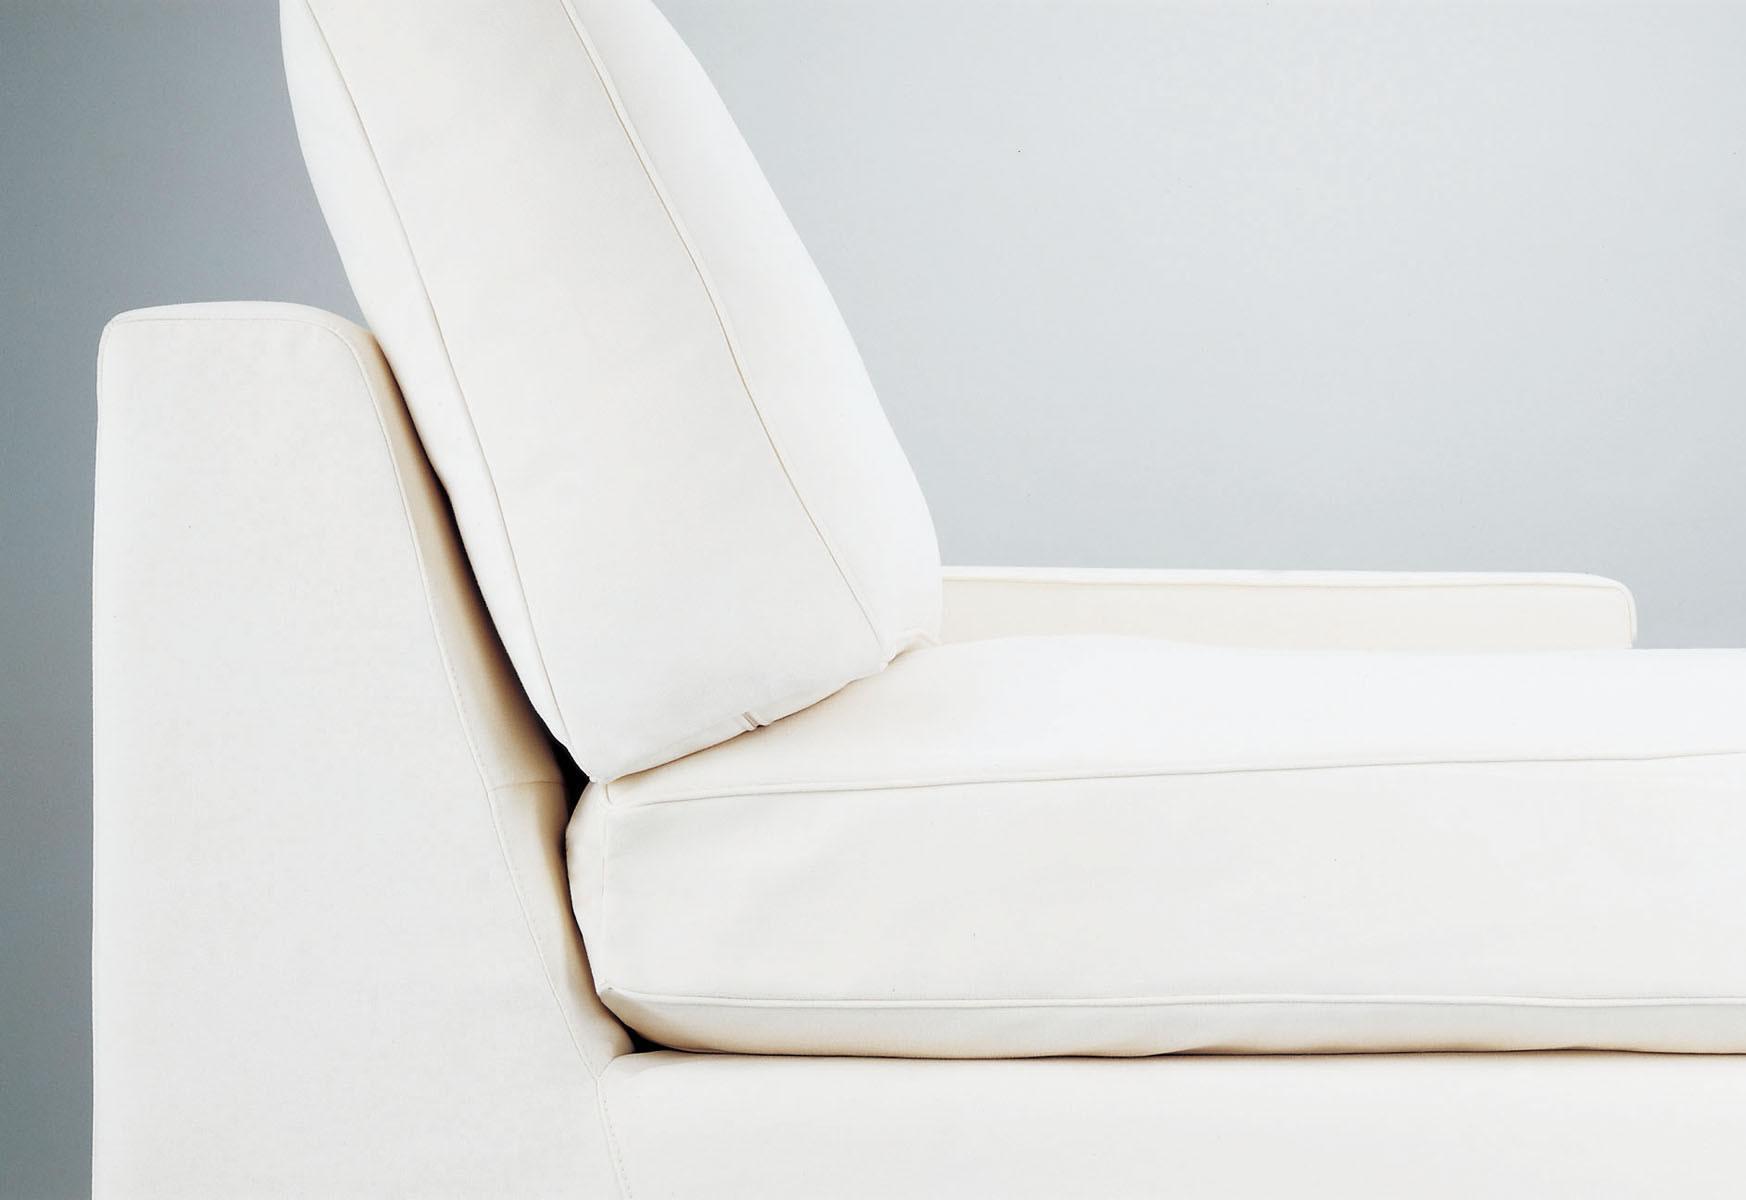 sofa blanco detalle Carmenes Mallorca